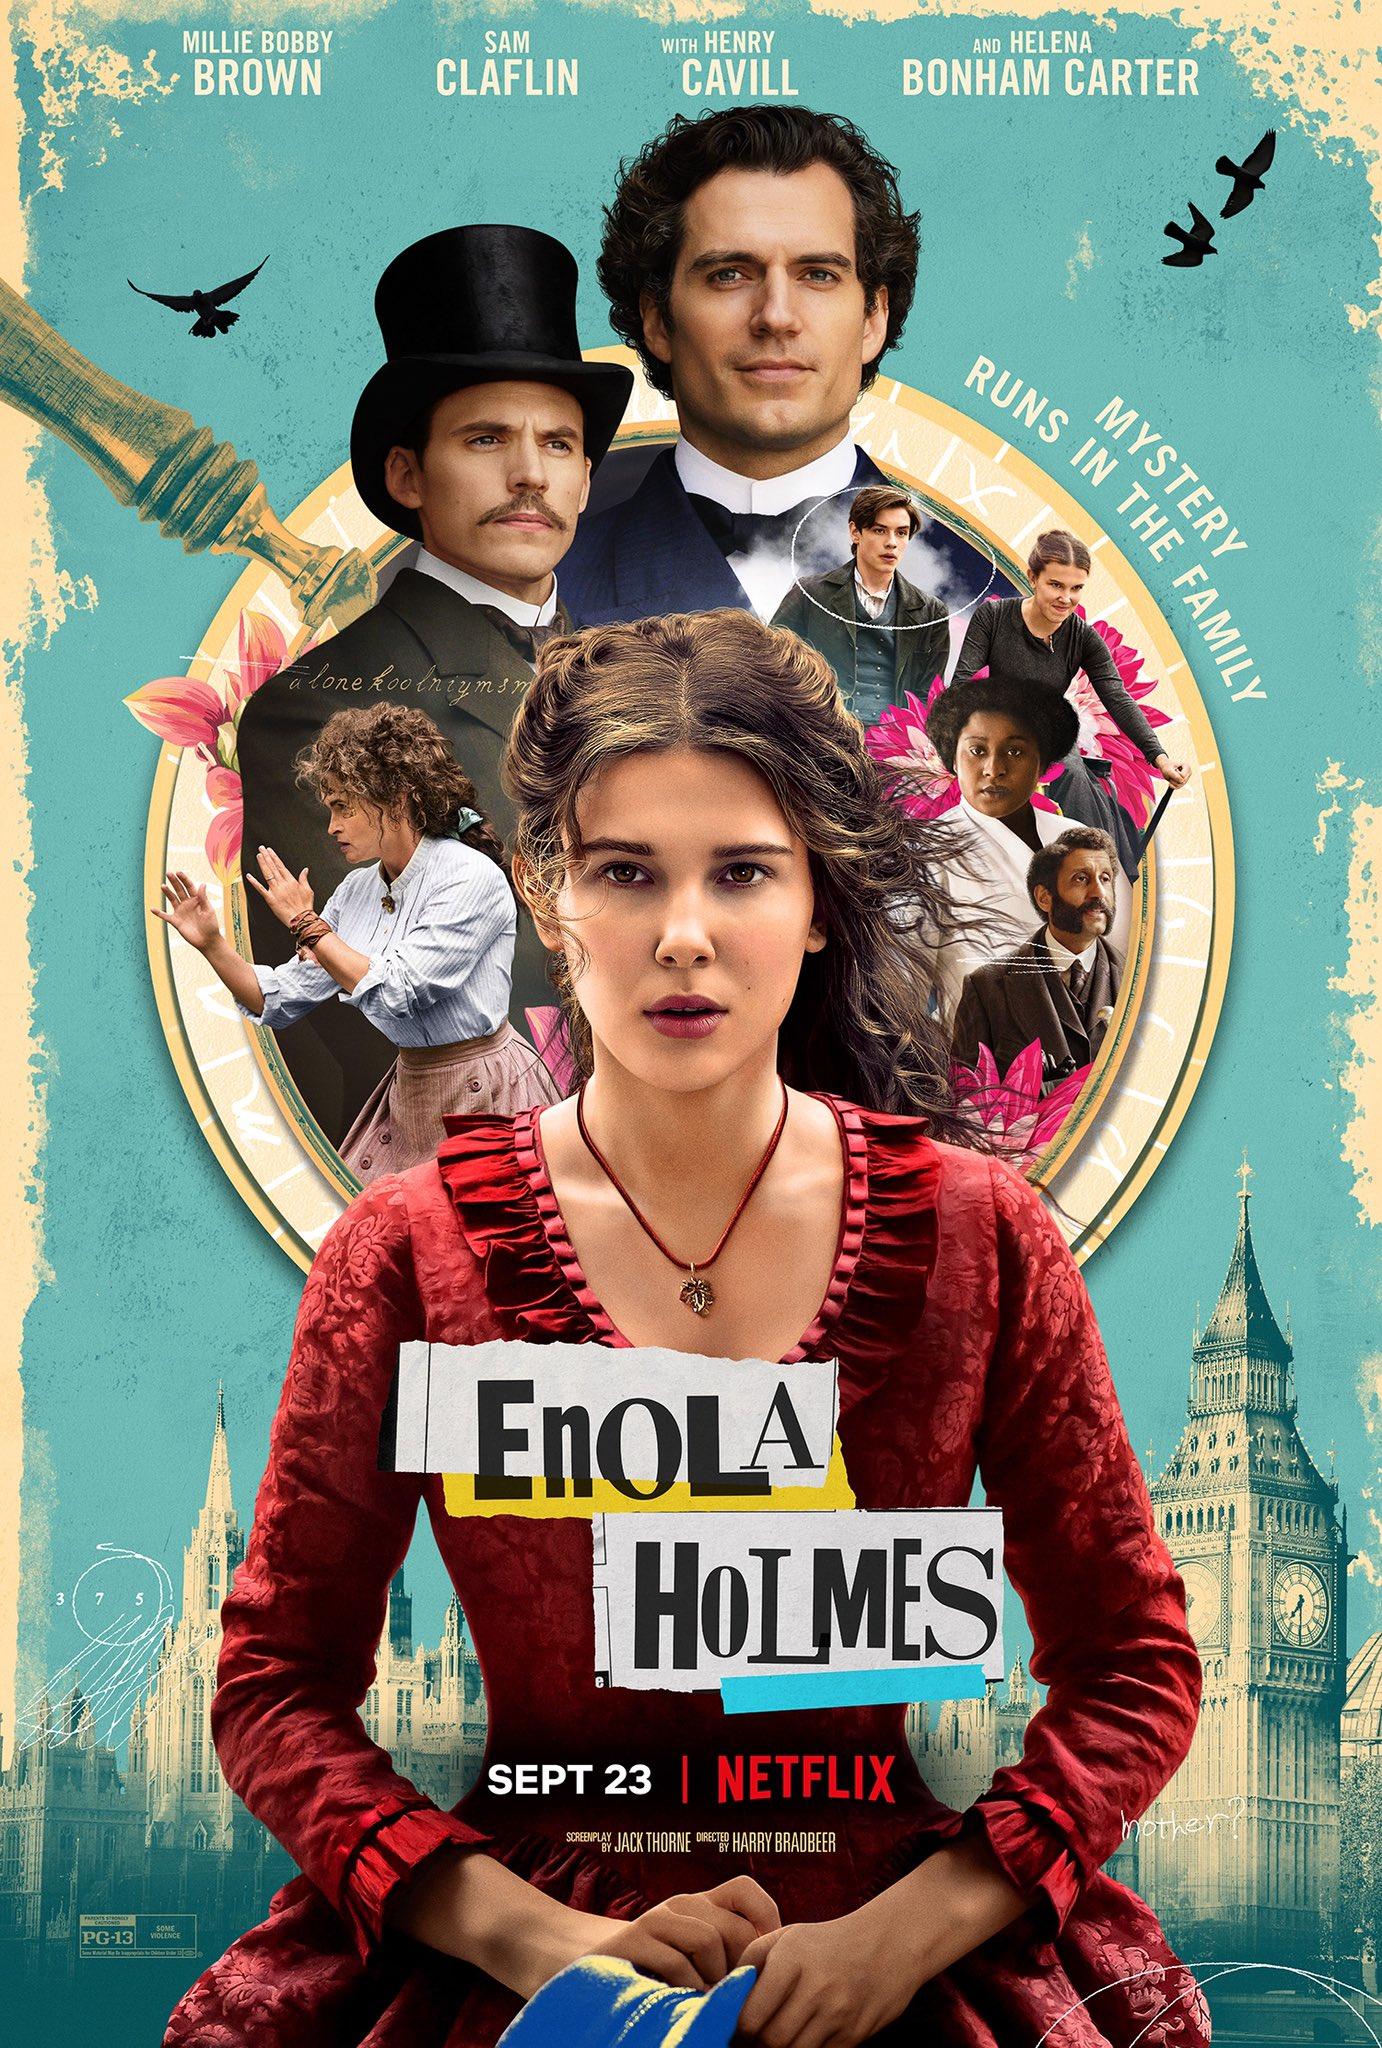 plex | El Póster de Enola Holmes, una Película de Netflix Sobre la Hermana  de Sherlock Holmes